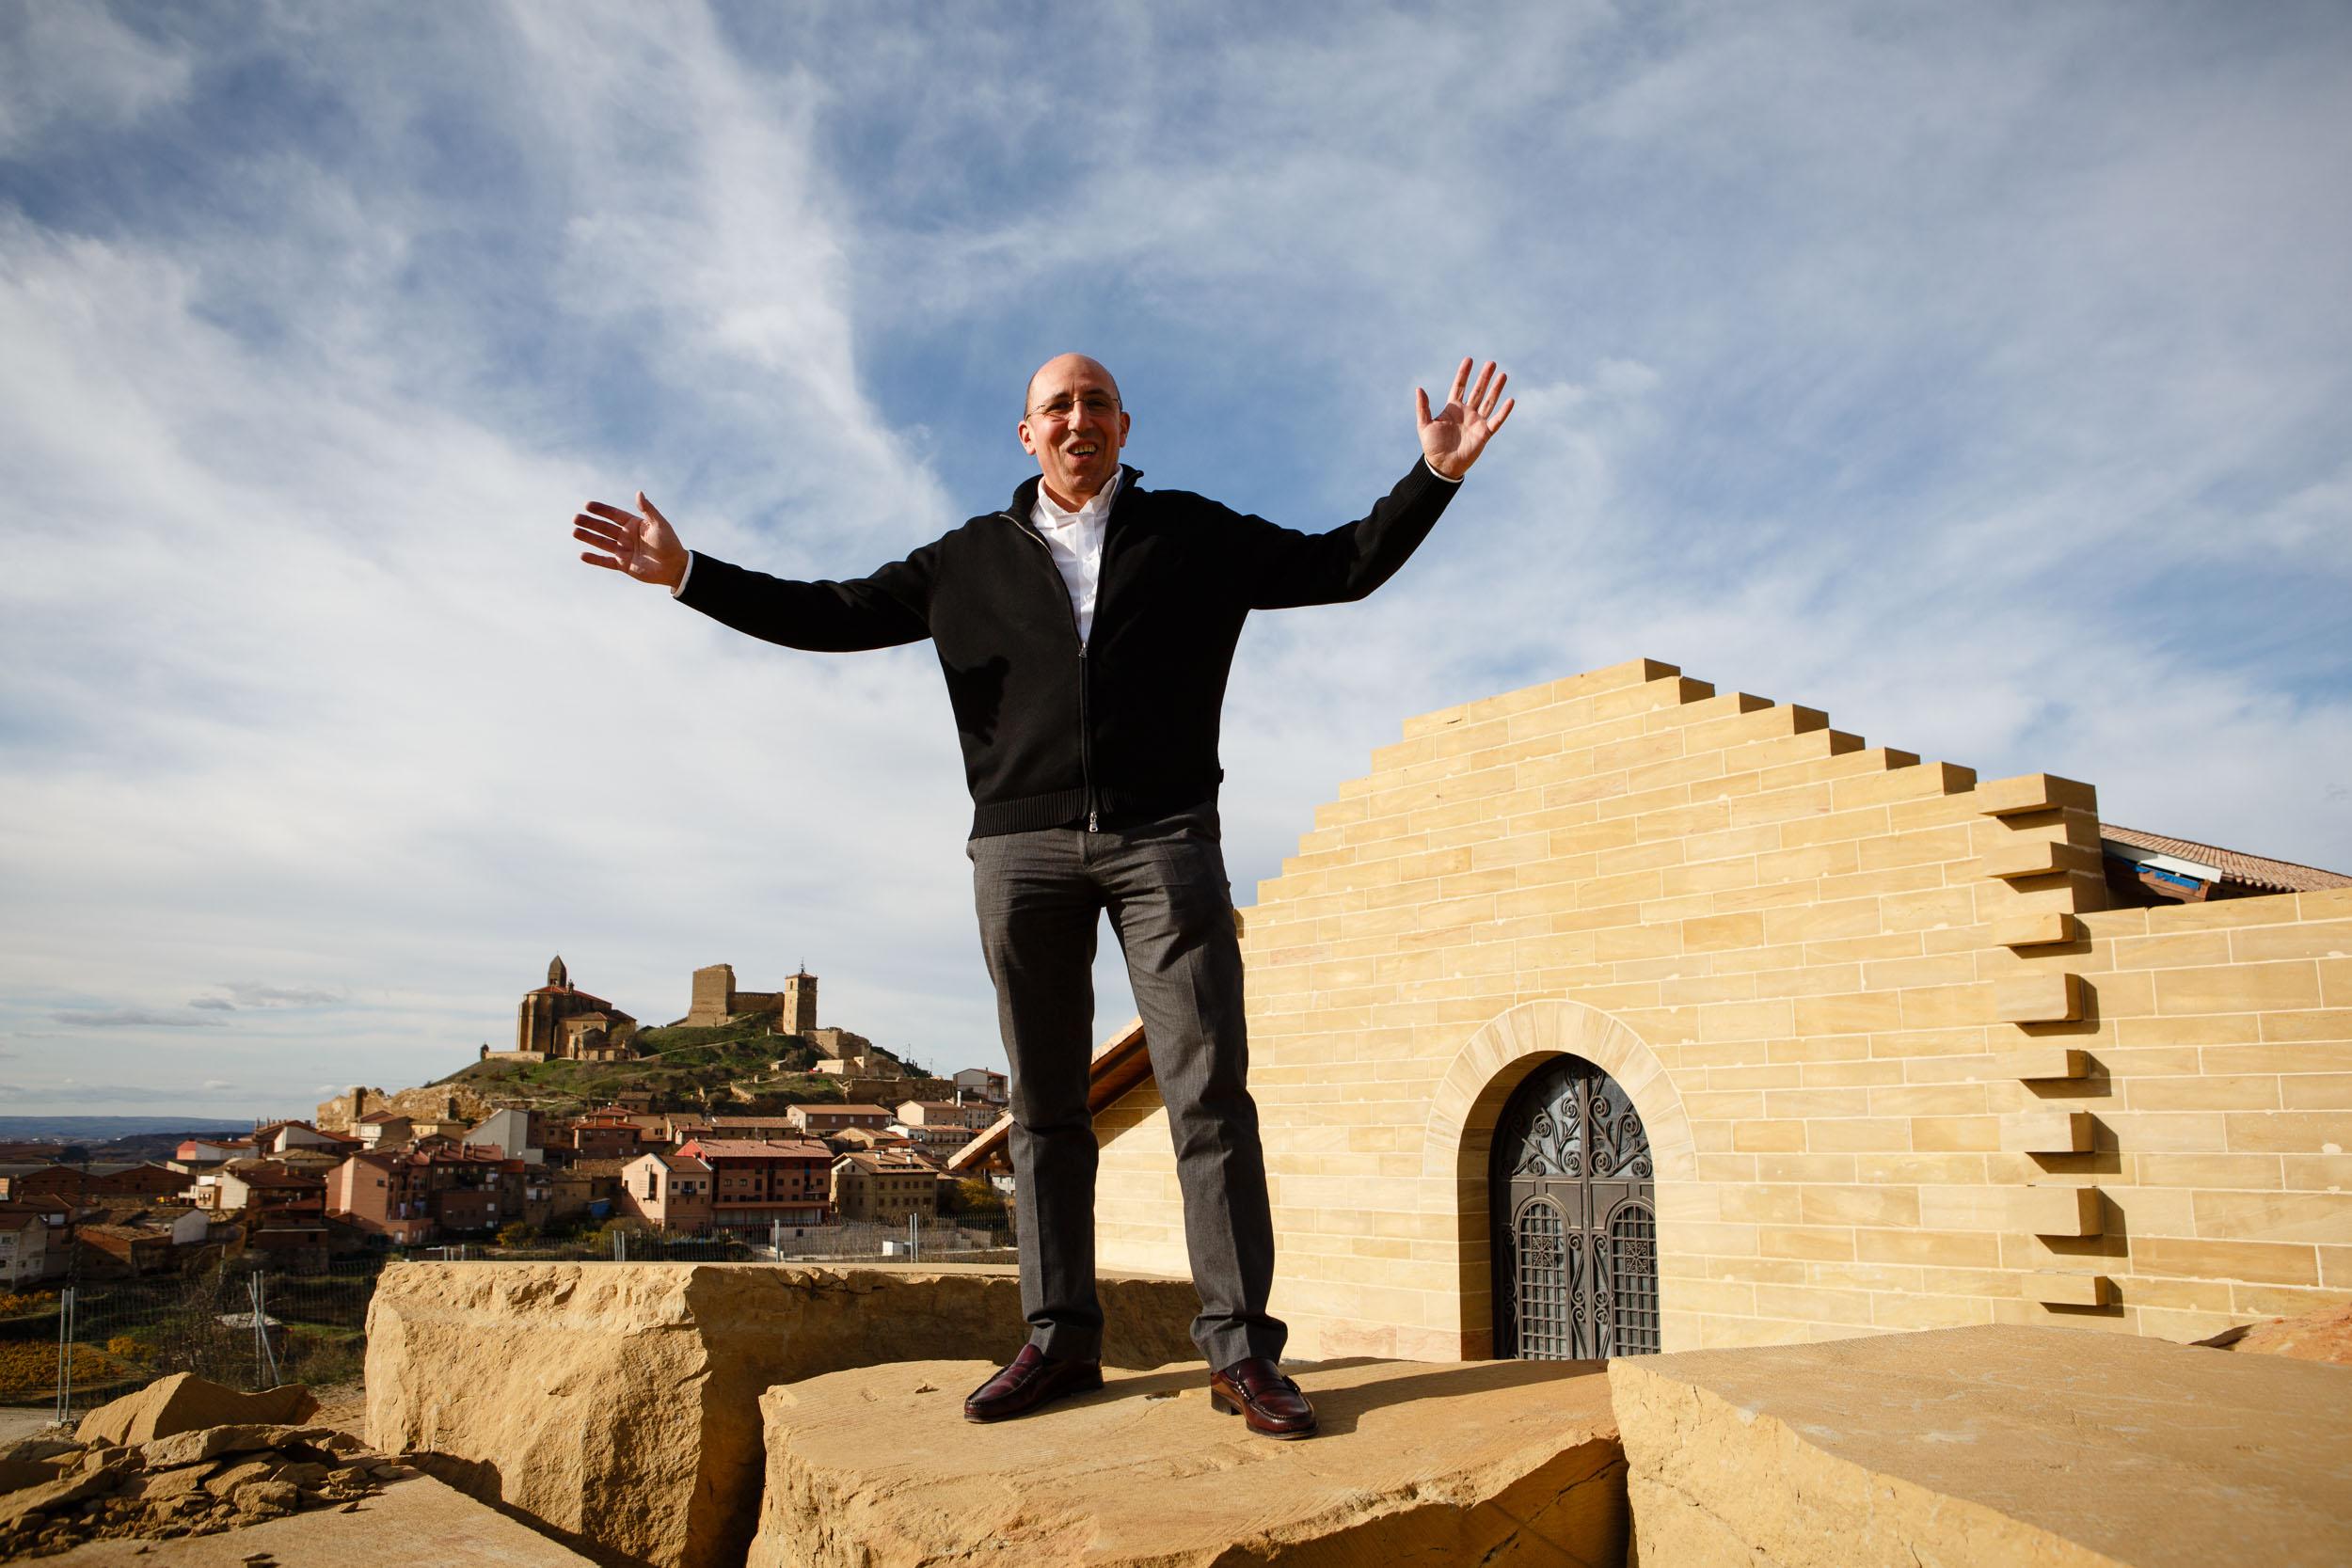 19/11/12 Marcos Eguren en la nueva bodega Sierra Cantabria, San Vicente de Sonsierra, La Rioja, España. Foto: James Sturcke | www.sturcke.org